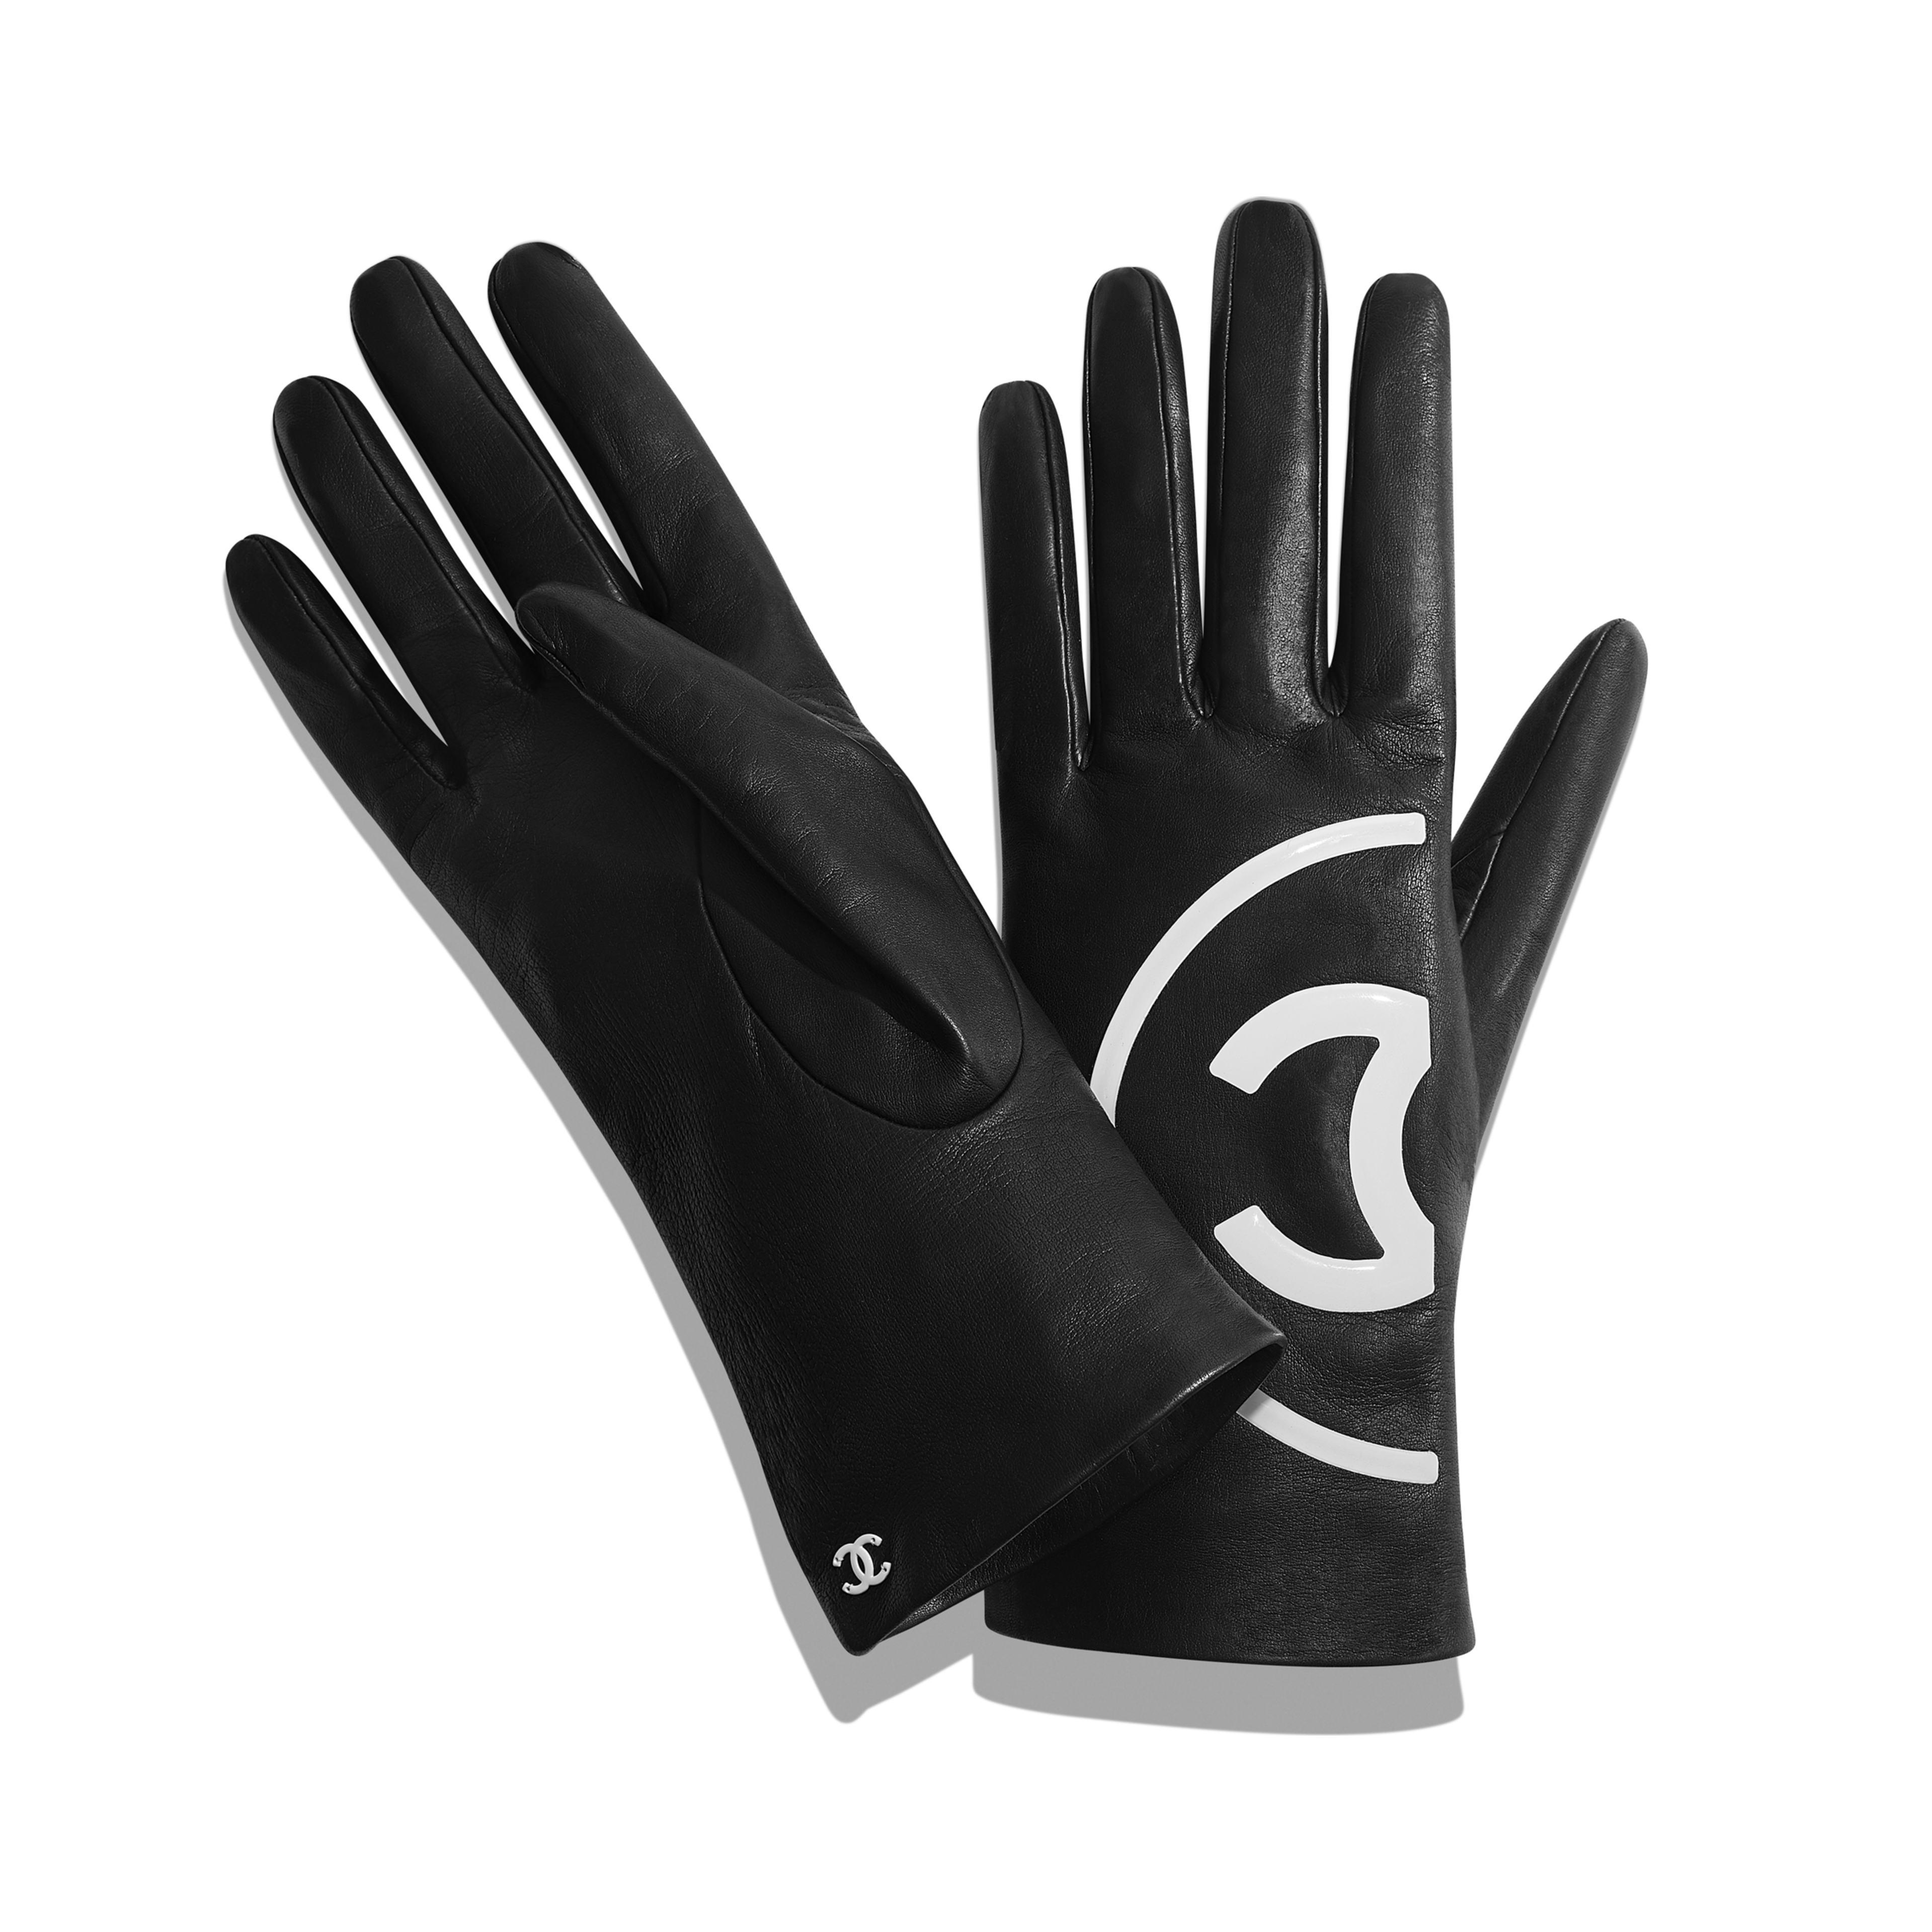 Gloves - Black & White - Lambskin - Alternative view - see full sized version